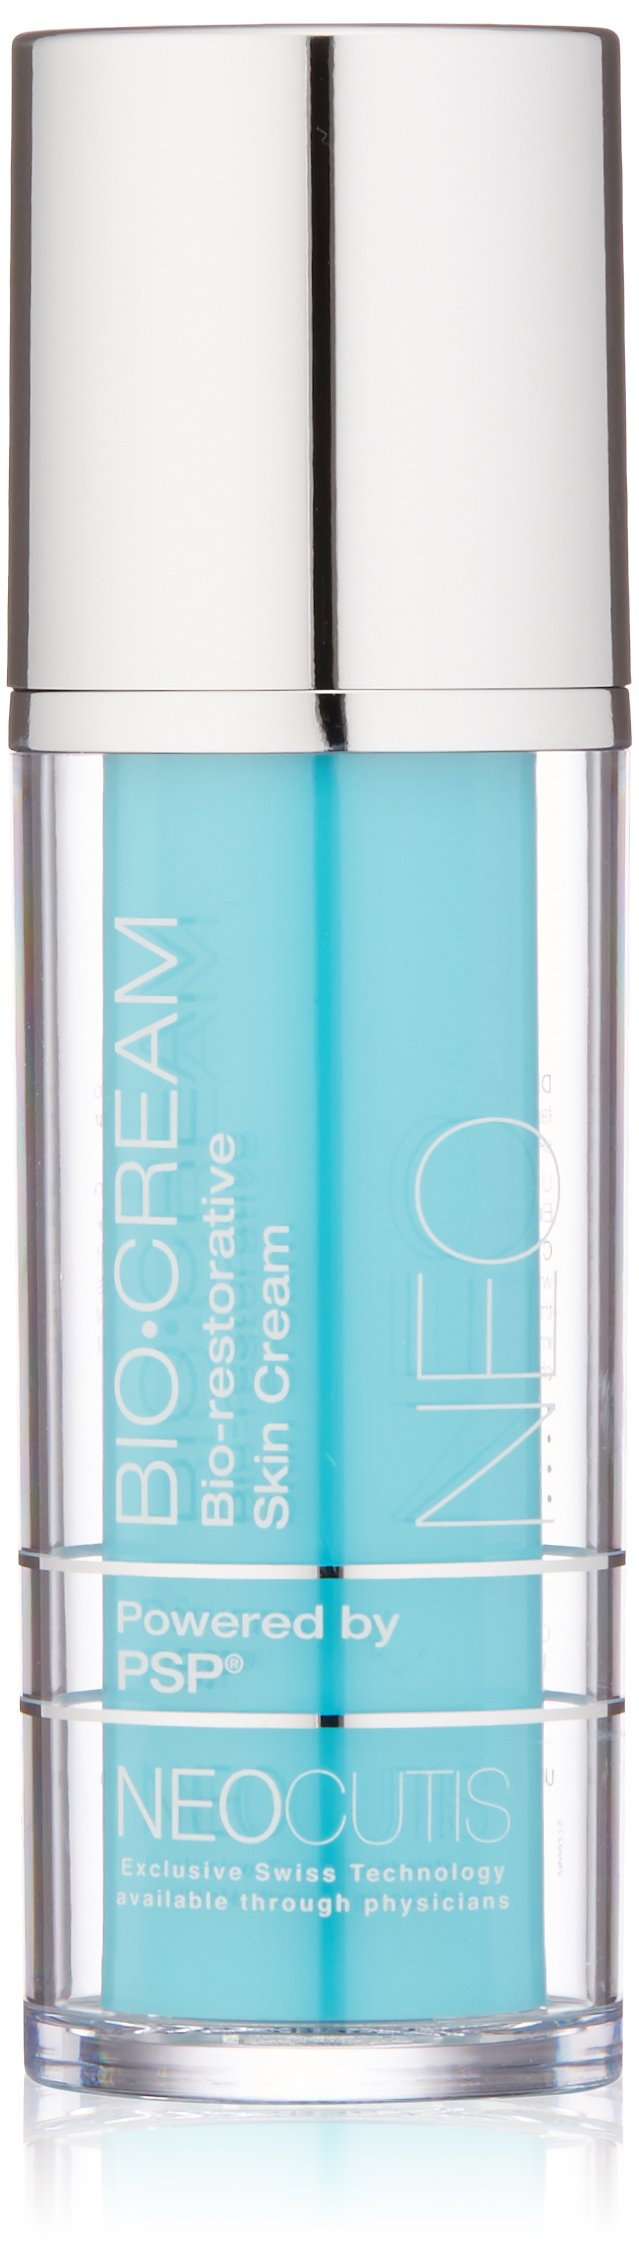 NEOCUTIS Bio-Cream Bio-restorative Skin Cream with PSP, 1 Fl Oz